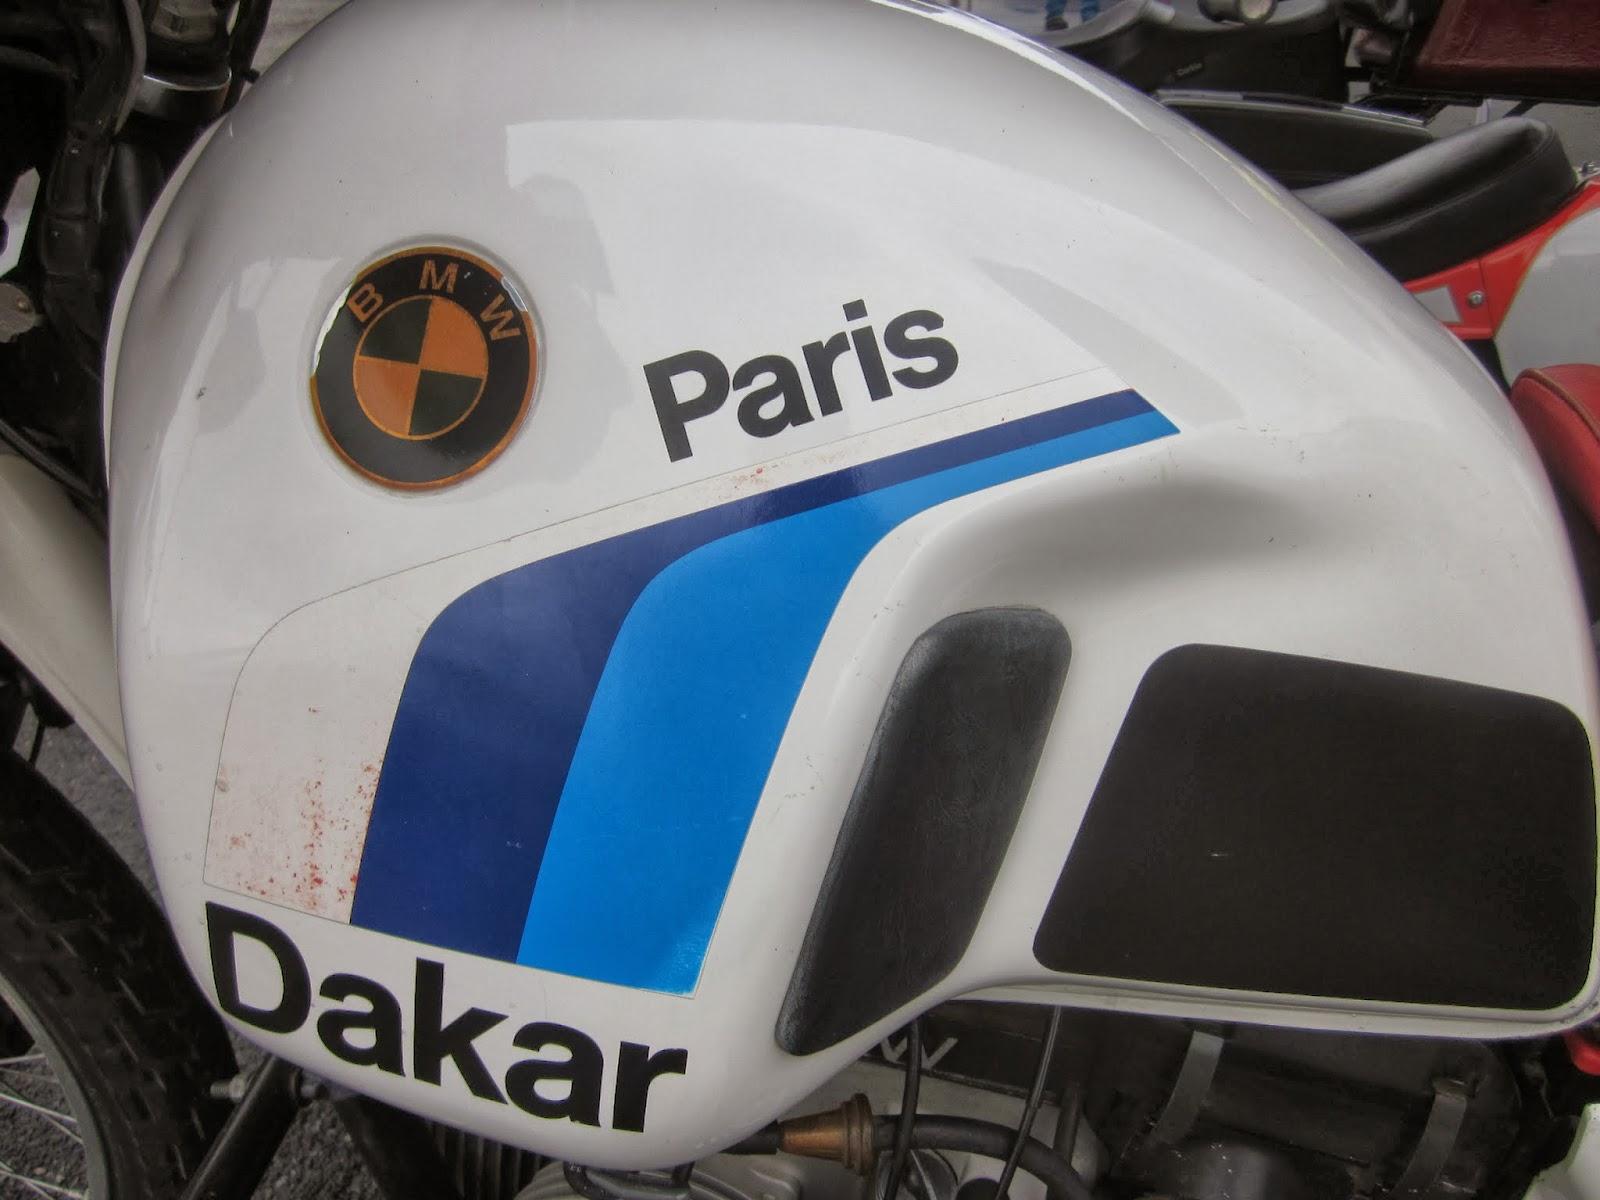 Oldmotodude 1985 Bmw R80gs Paris Dakar On Display At The 2013 Retro